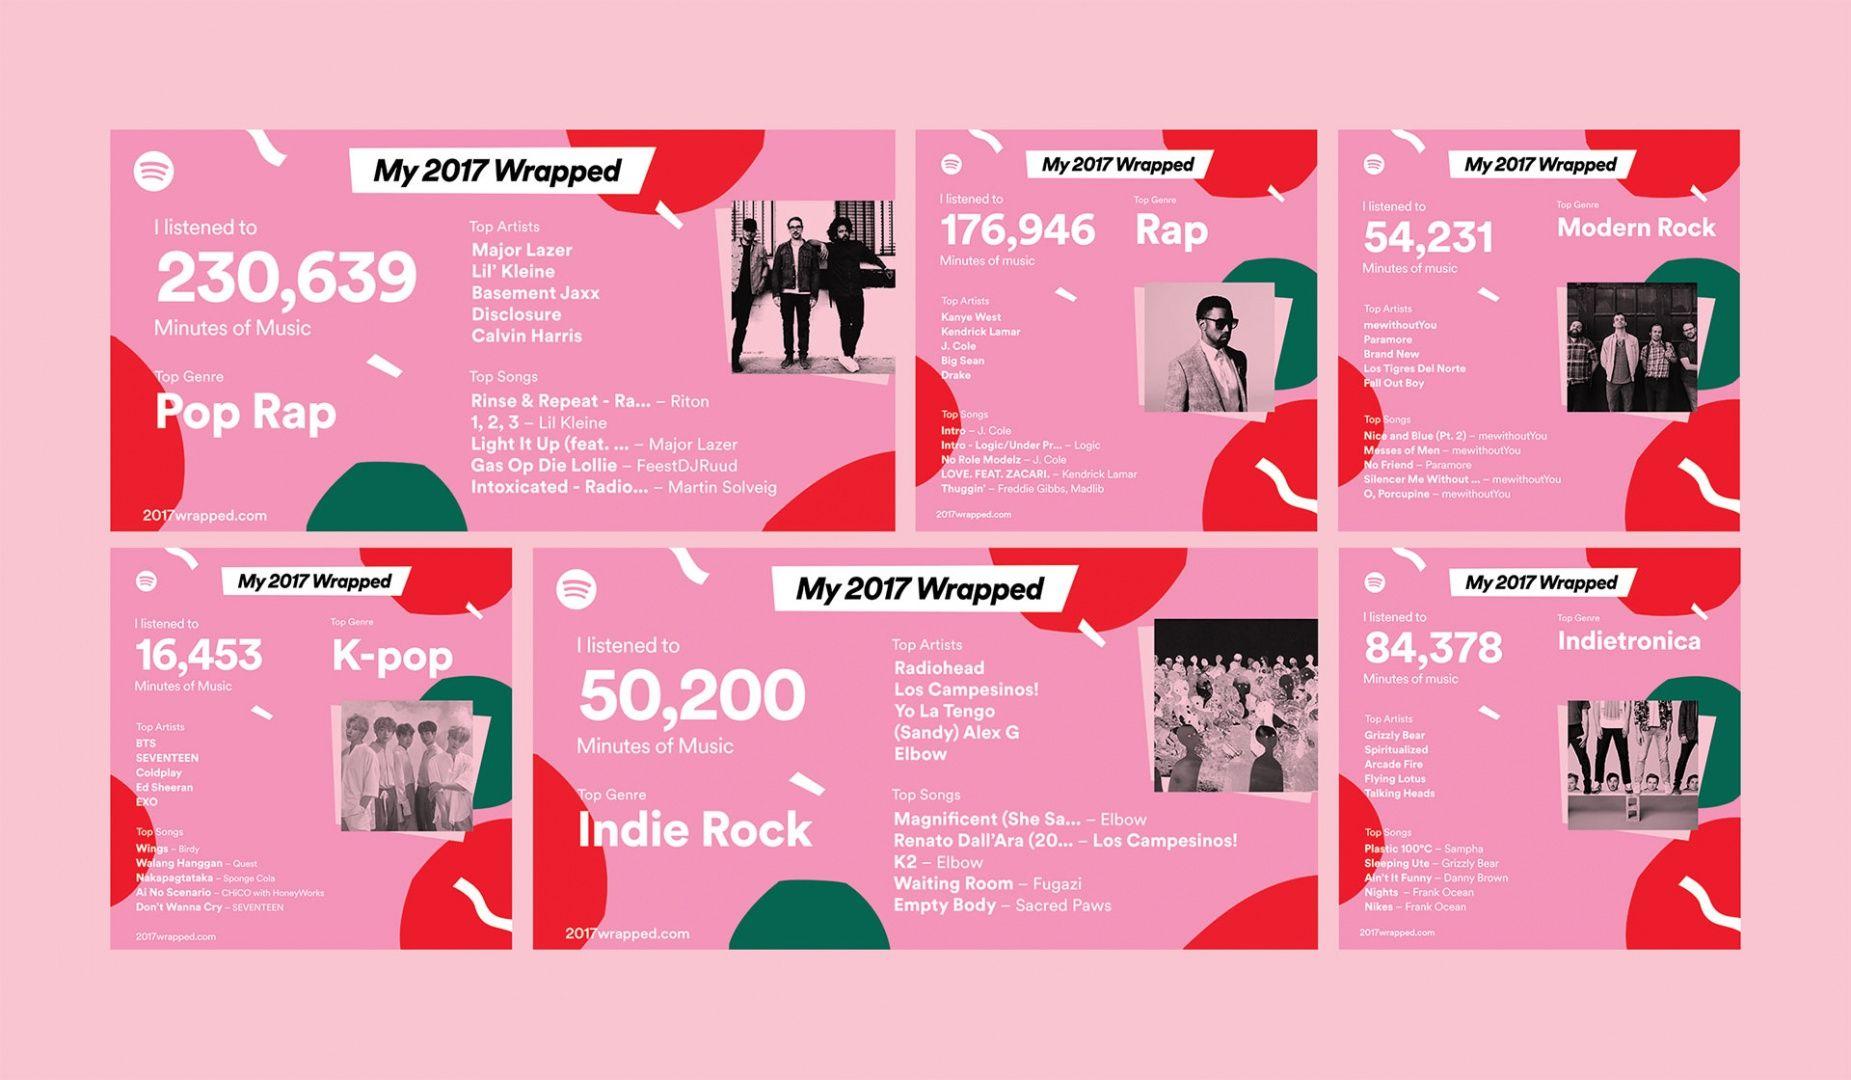 Spotify Your 2017 Wrapped website by Spotify Spotify